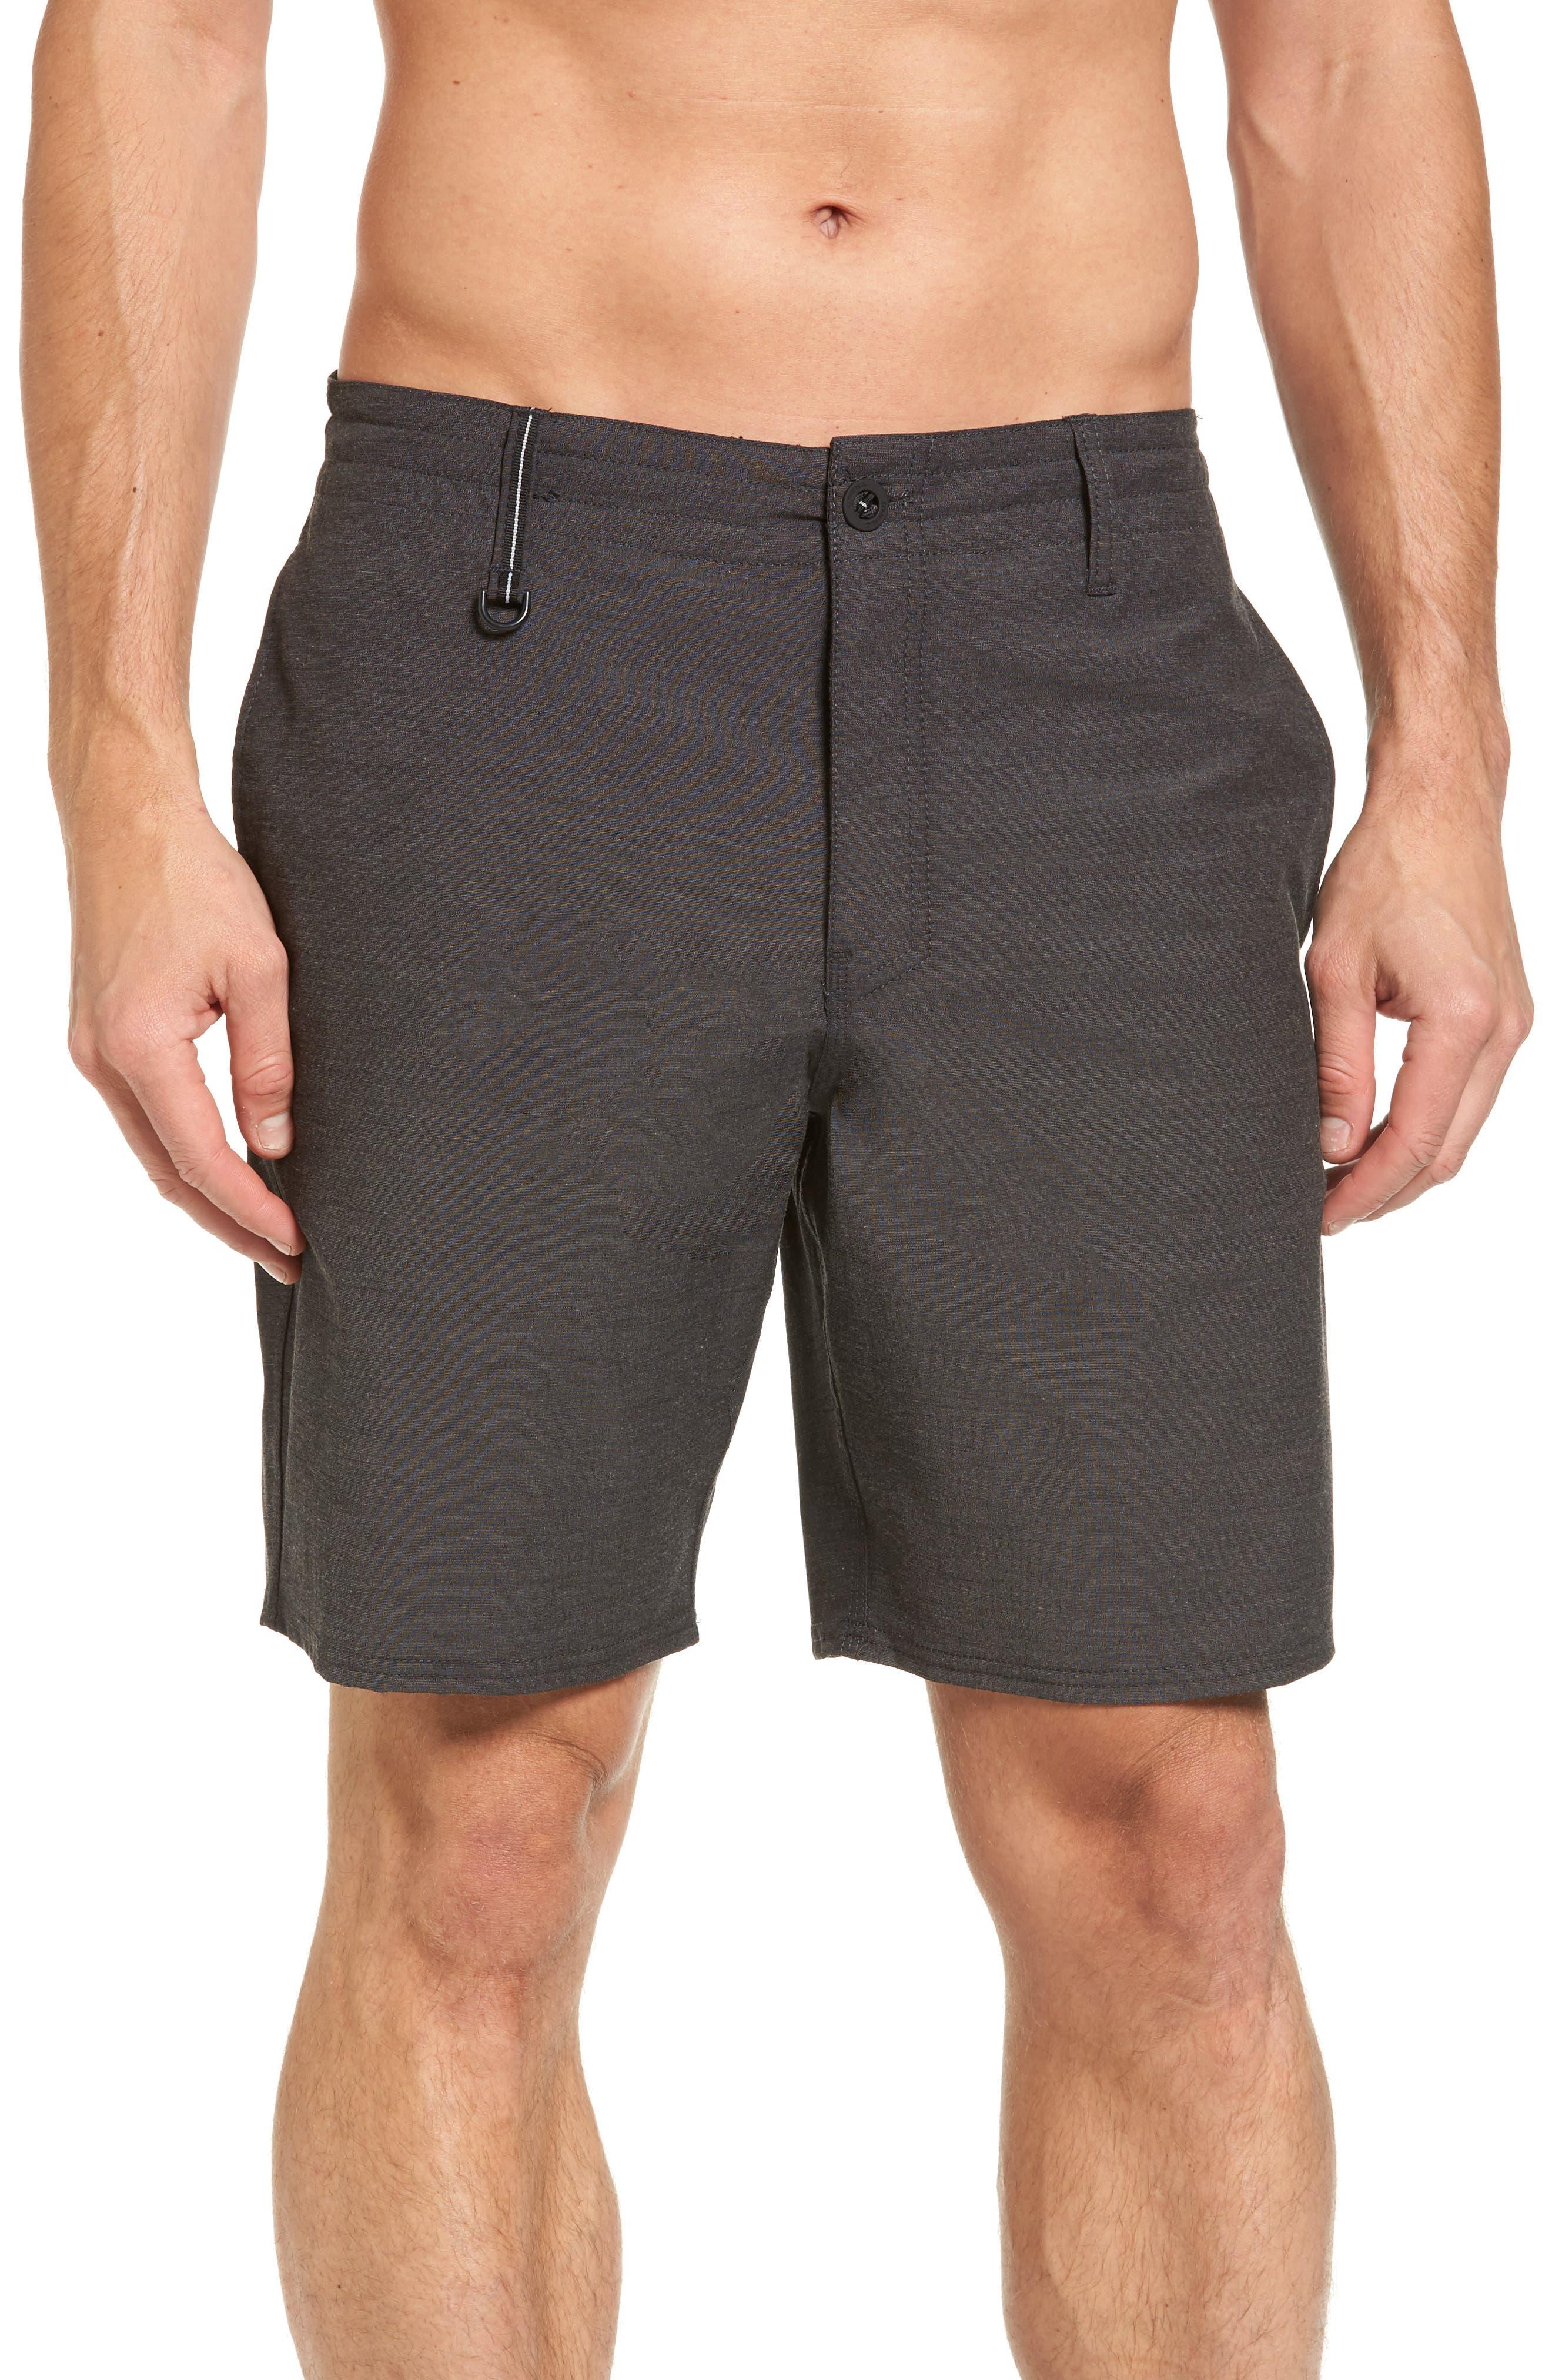 Traveler Recon Hybrid Shorts,                             Alternate thumbnail 4, color,                             001